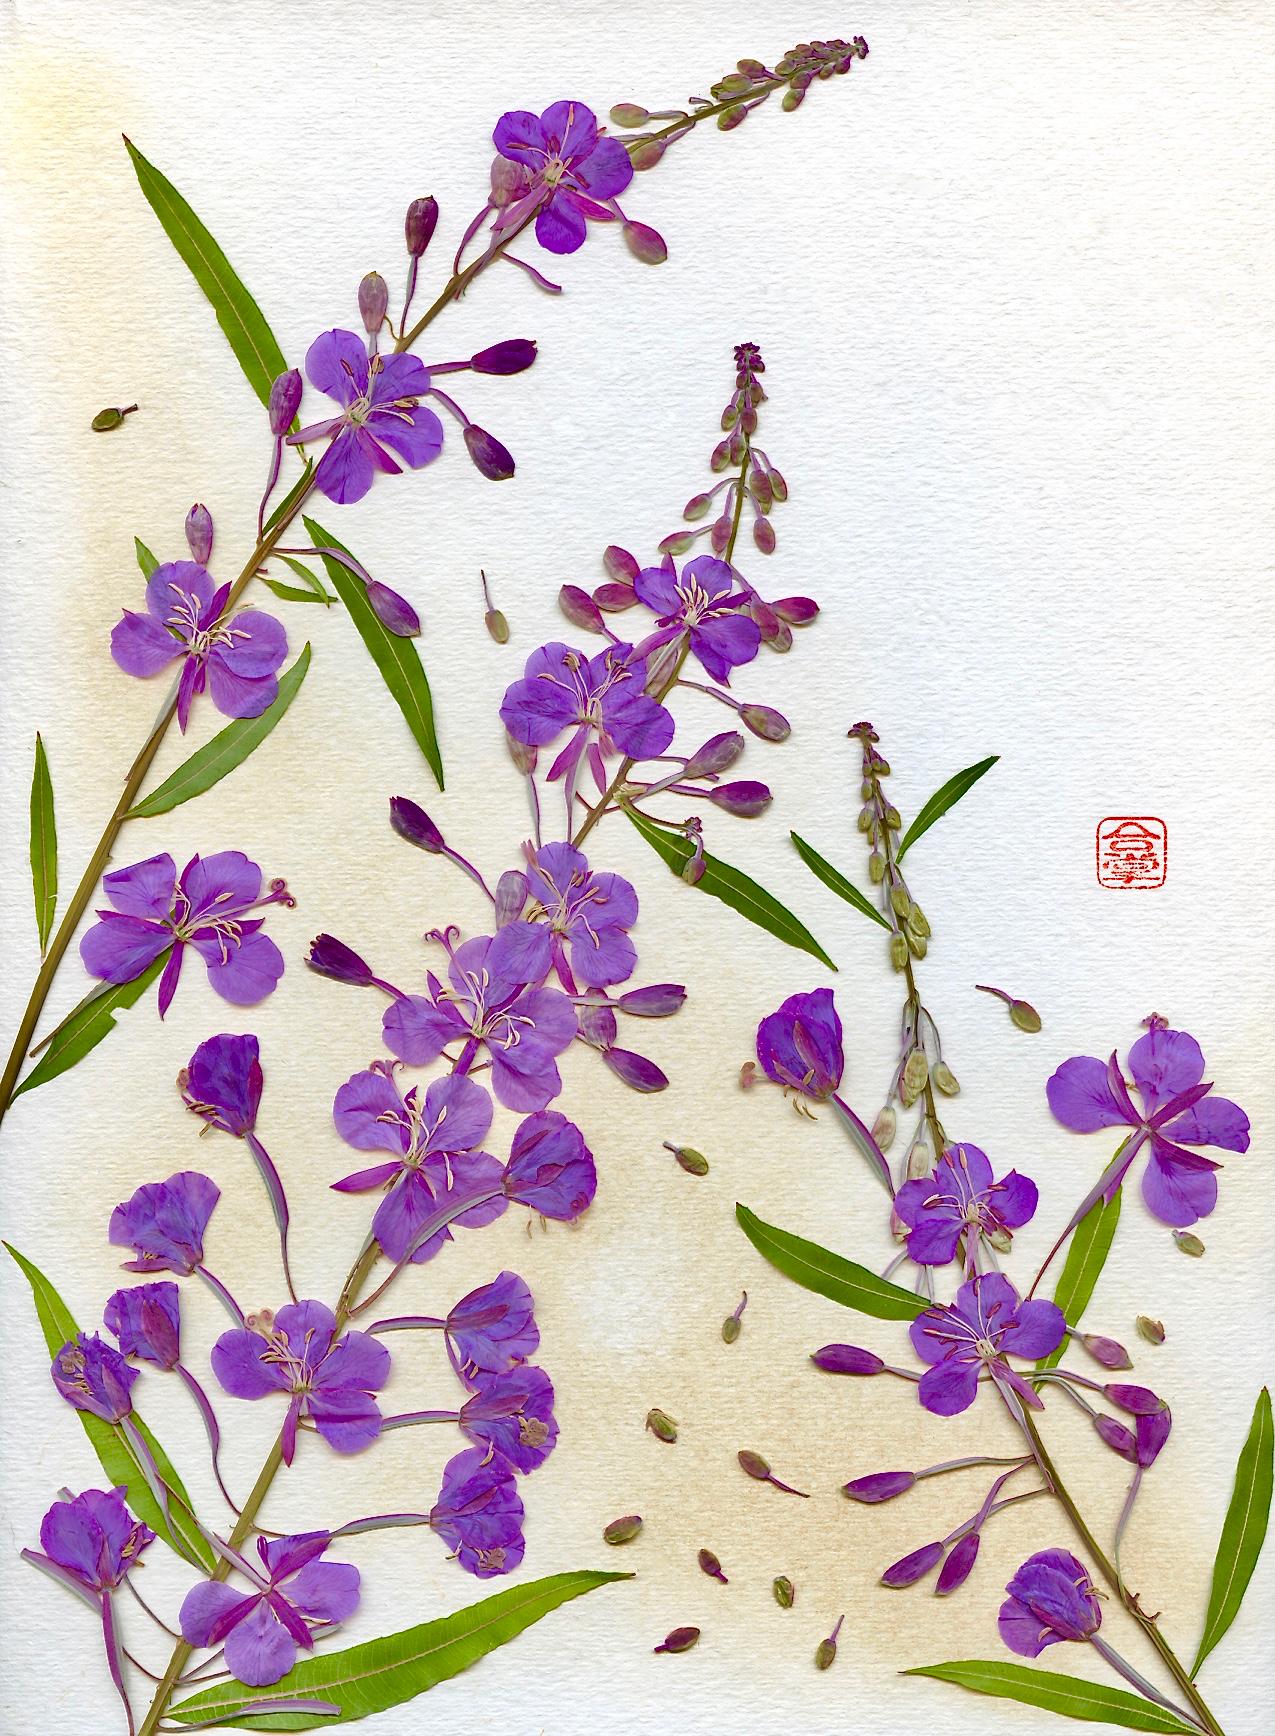 purple flowers summer 2017 (1).jpg